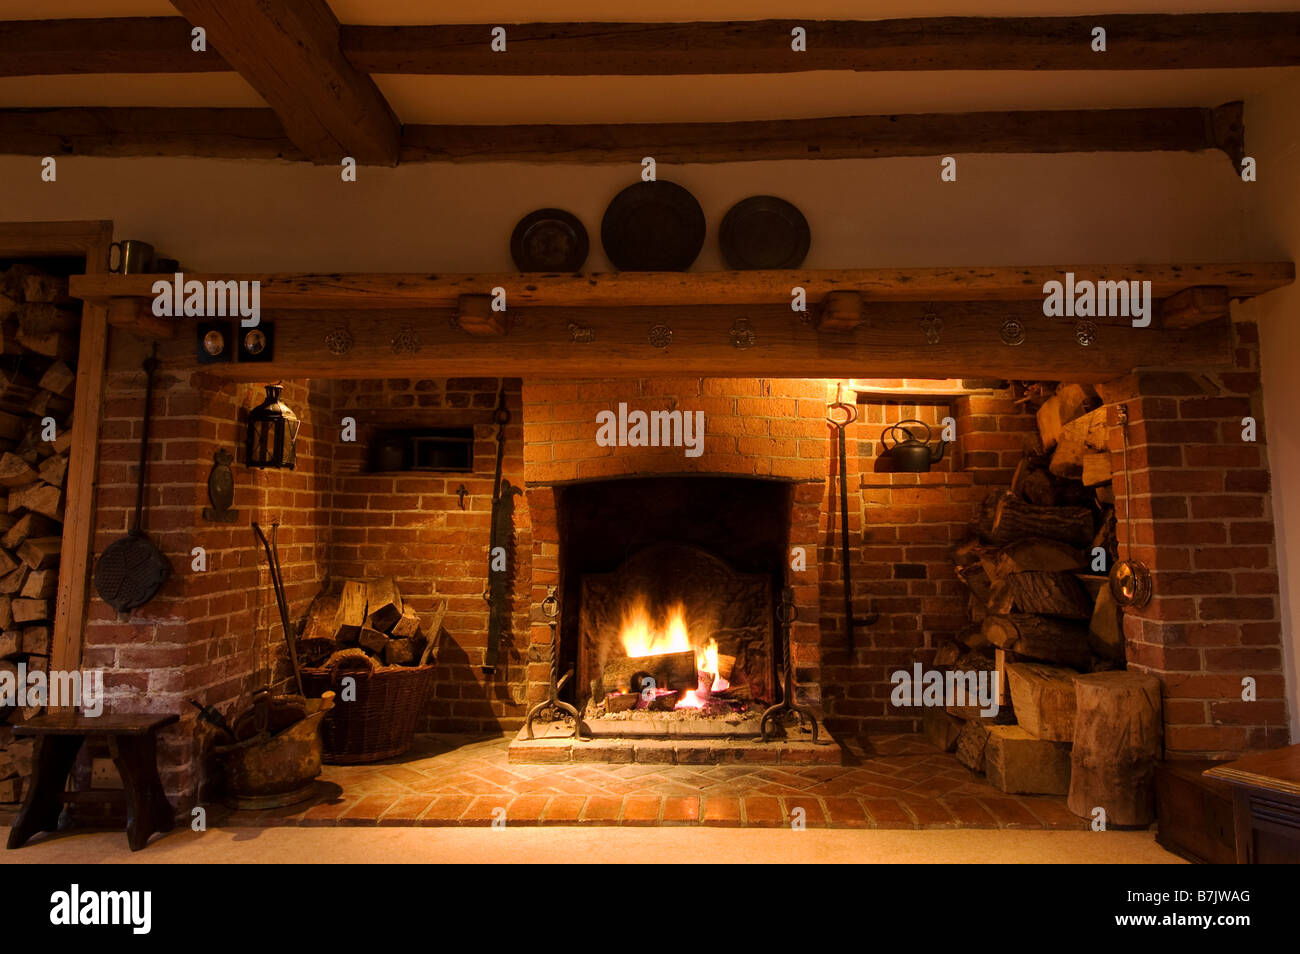 Inglenook Fireplace Stock Photo 21927992 Alamy